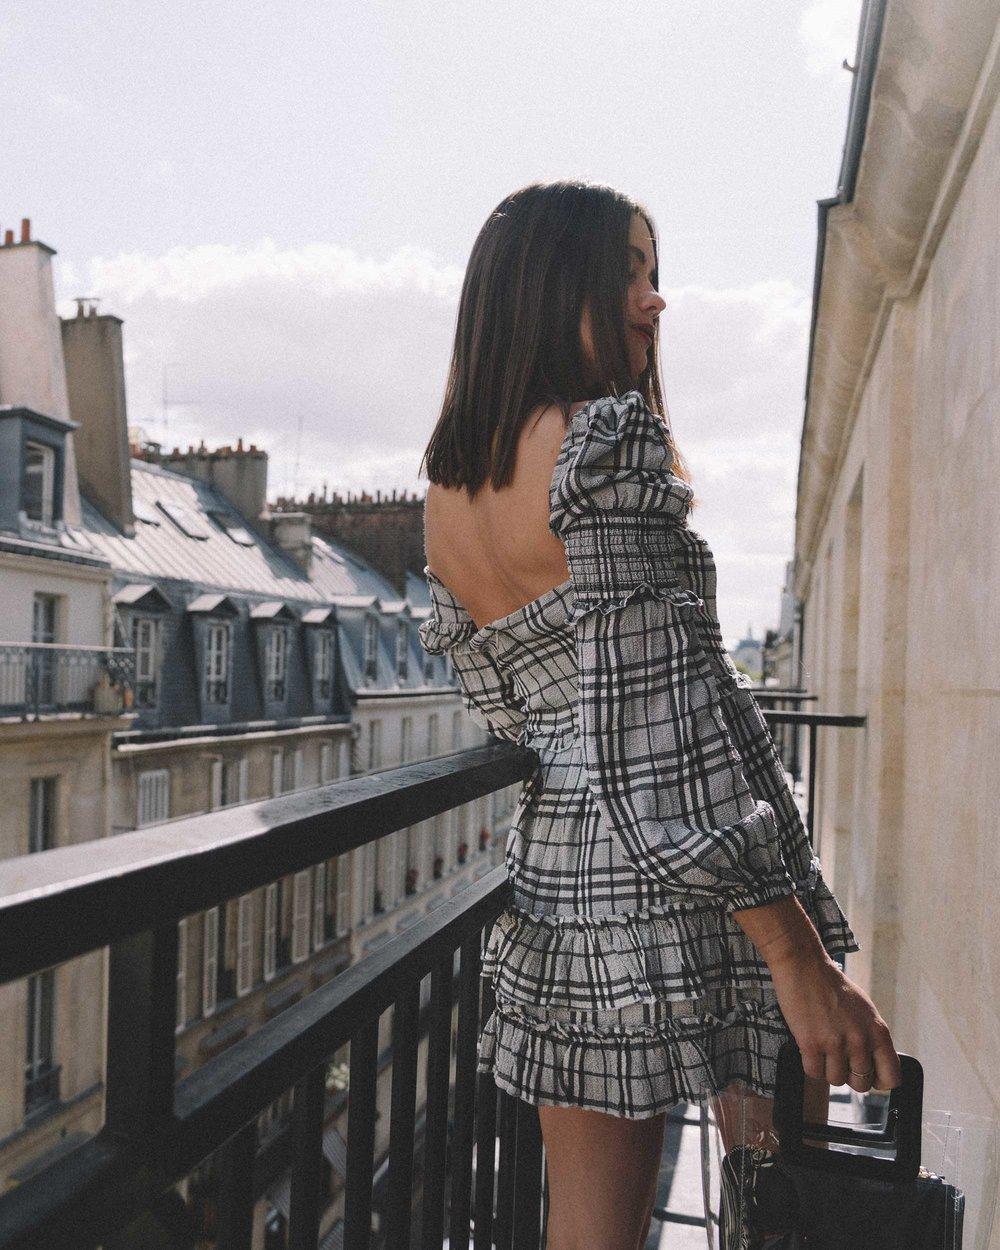 MAJORELLE Plaid Long Sleeve Dress Paris Girl Balcony Outfit3.jpg